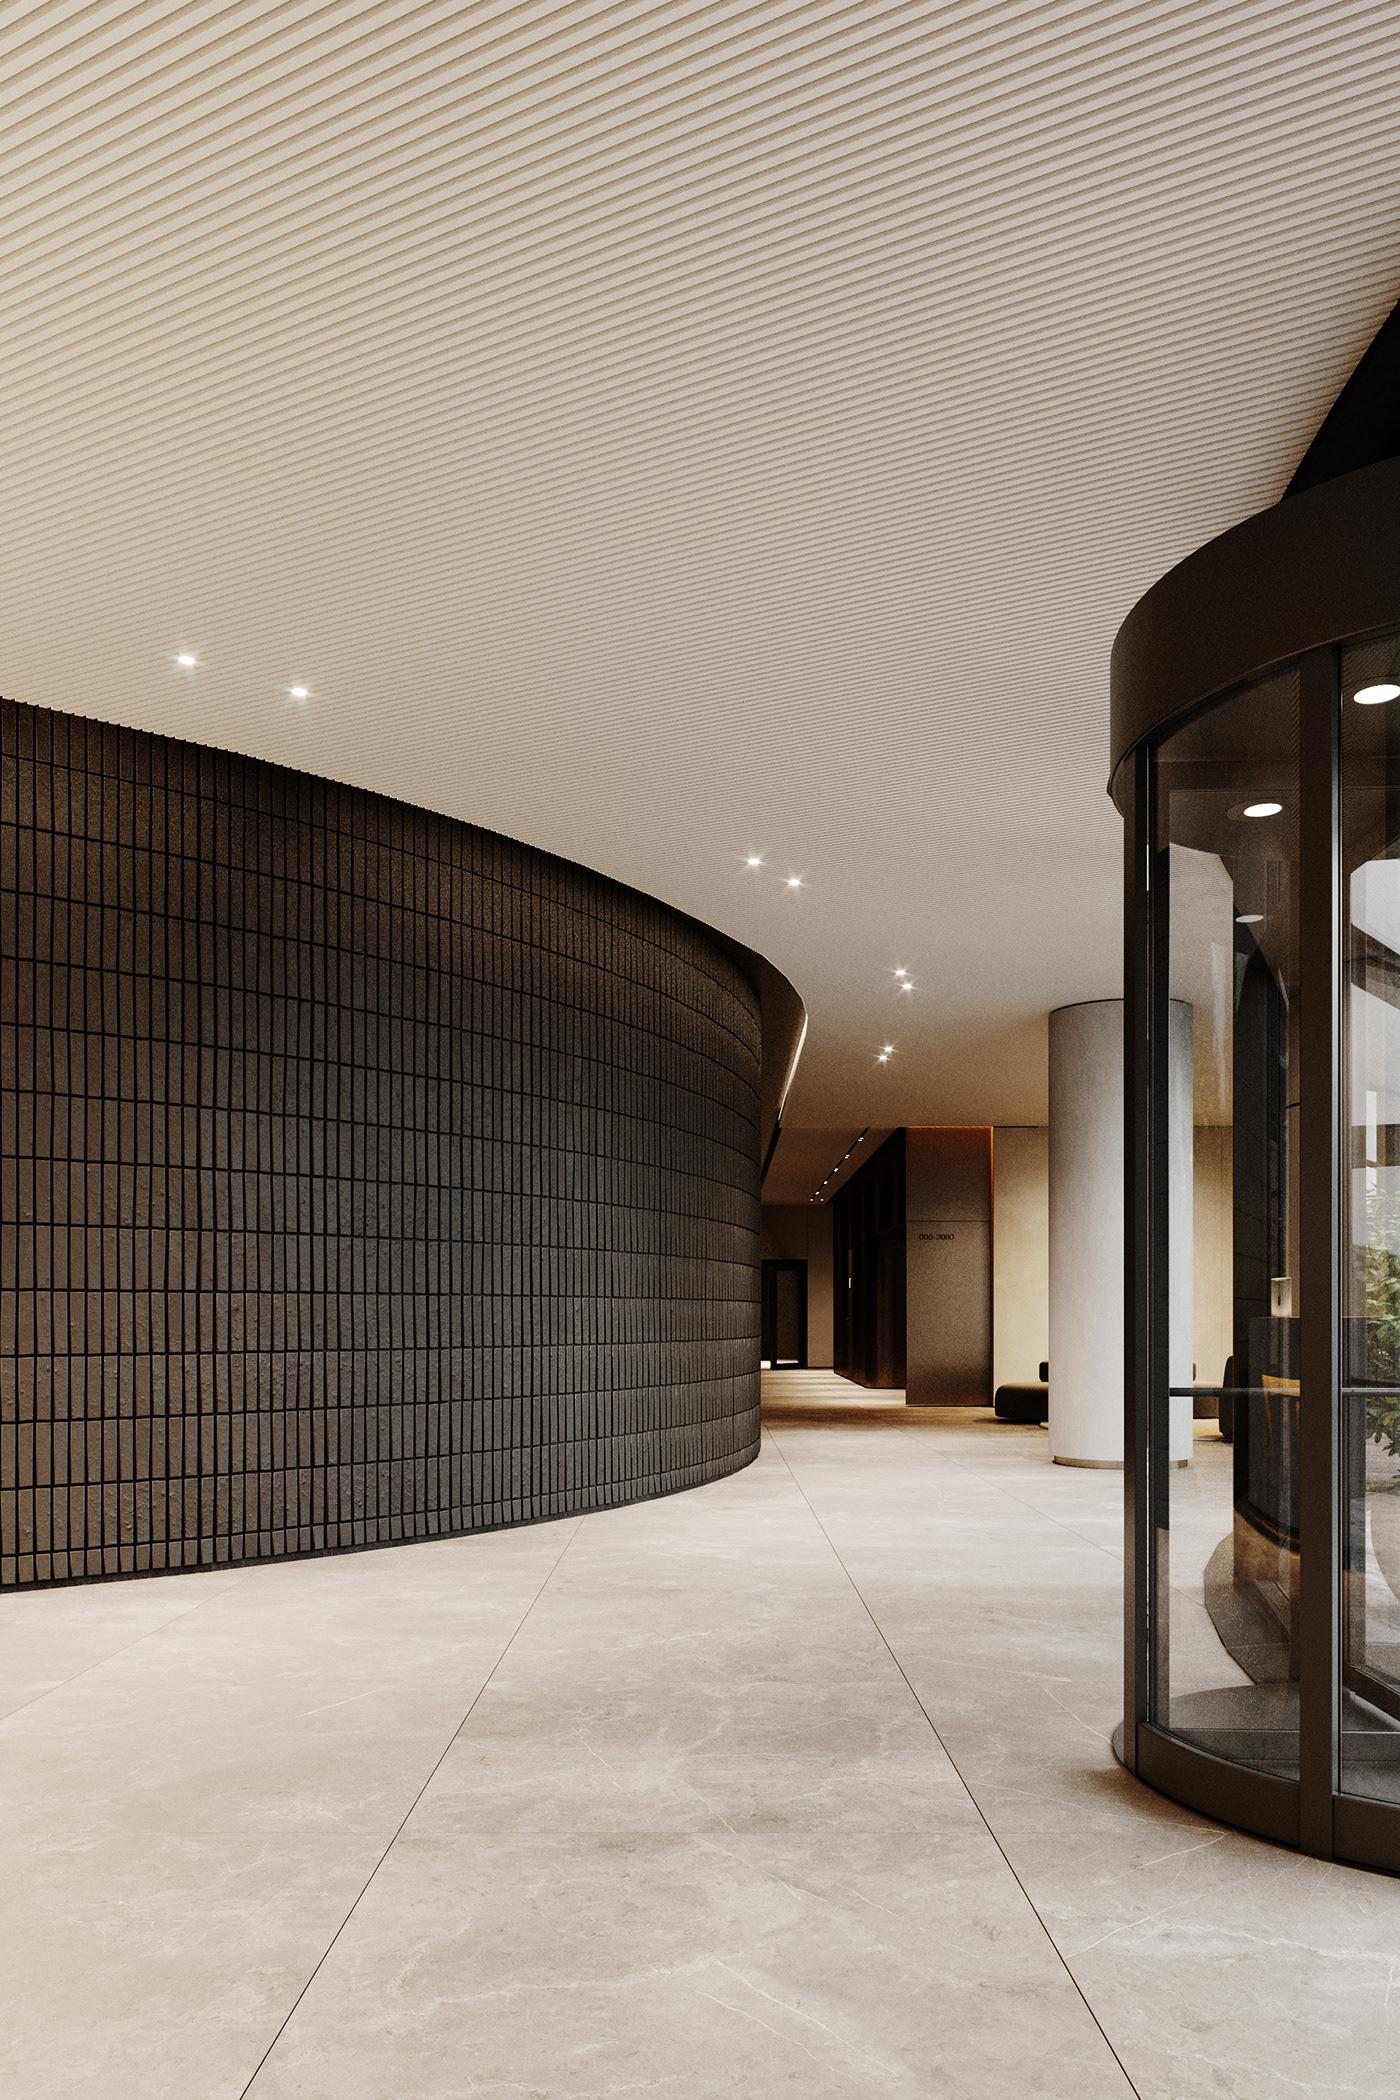 architecture archviz elevator Interior interior design  Lobby Render Residence visualization 3ds max